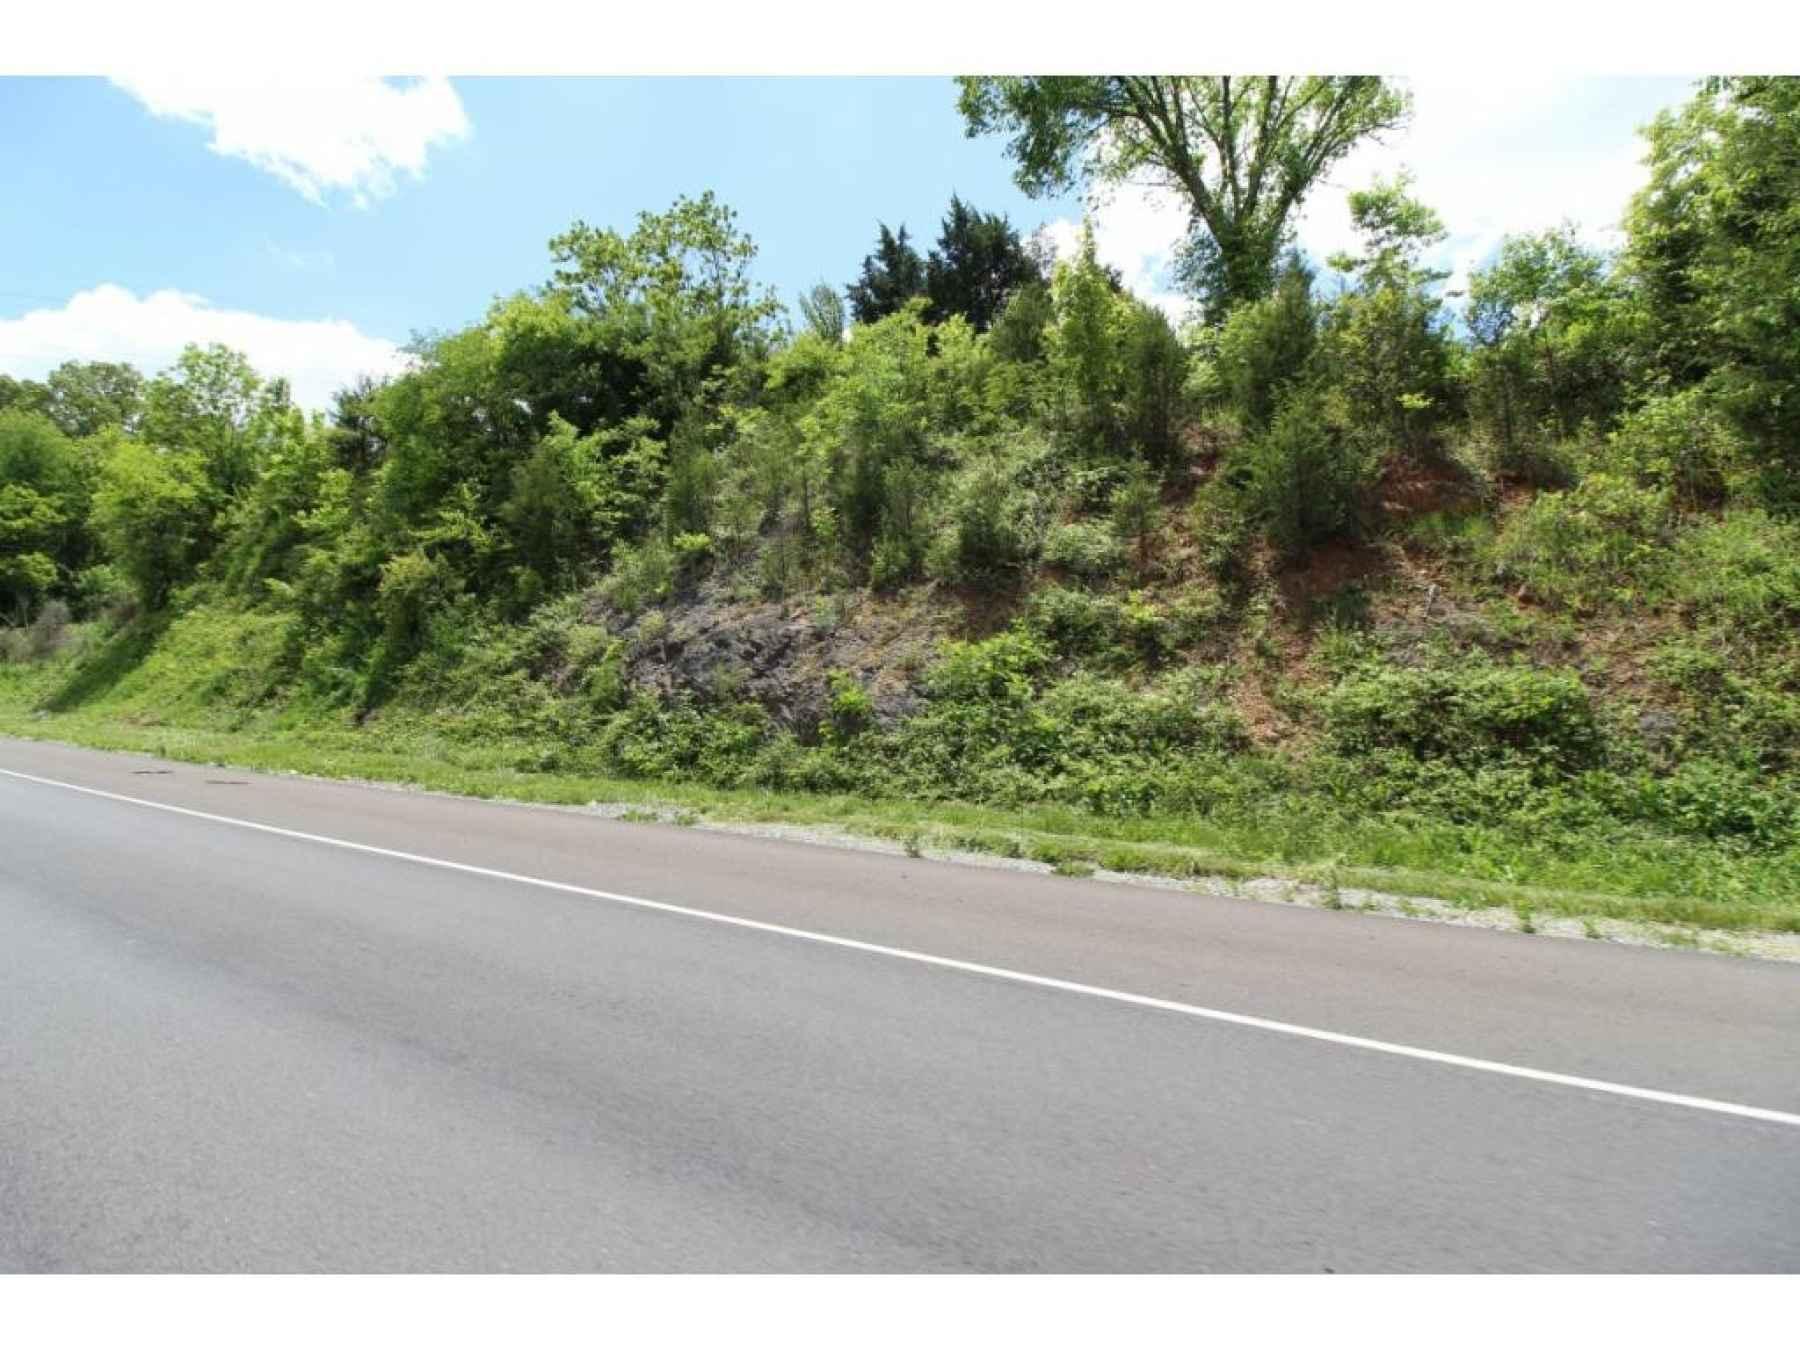 Photo forMoreland Drive